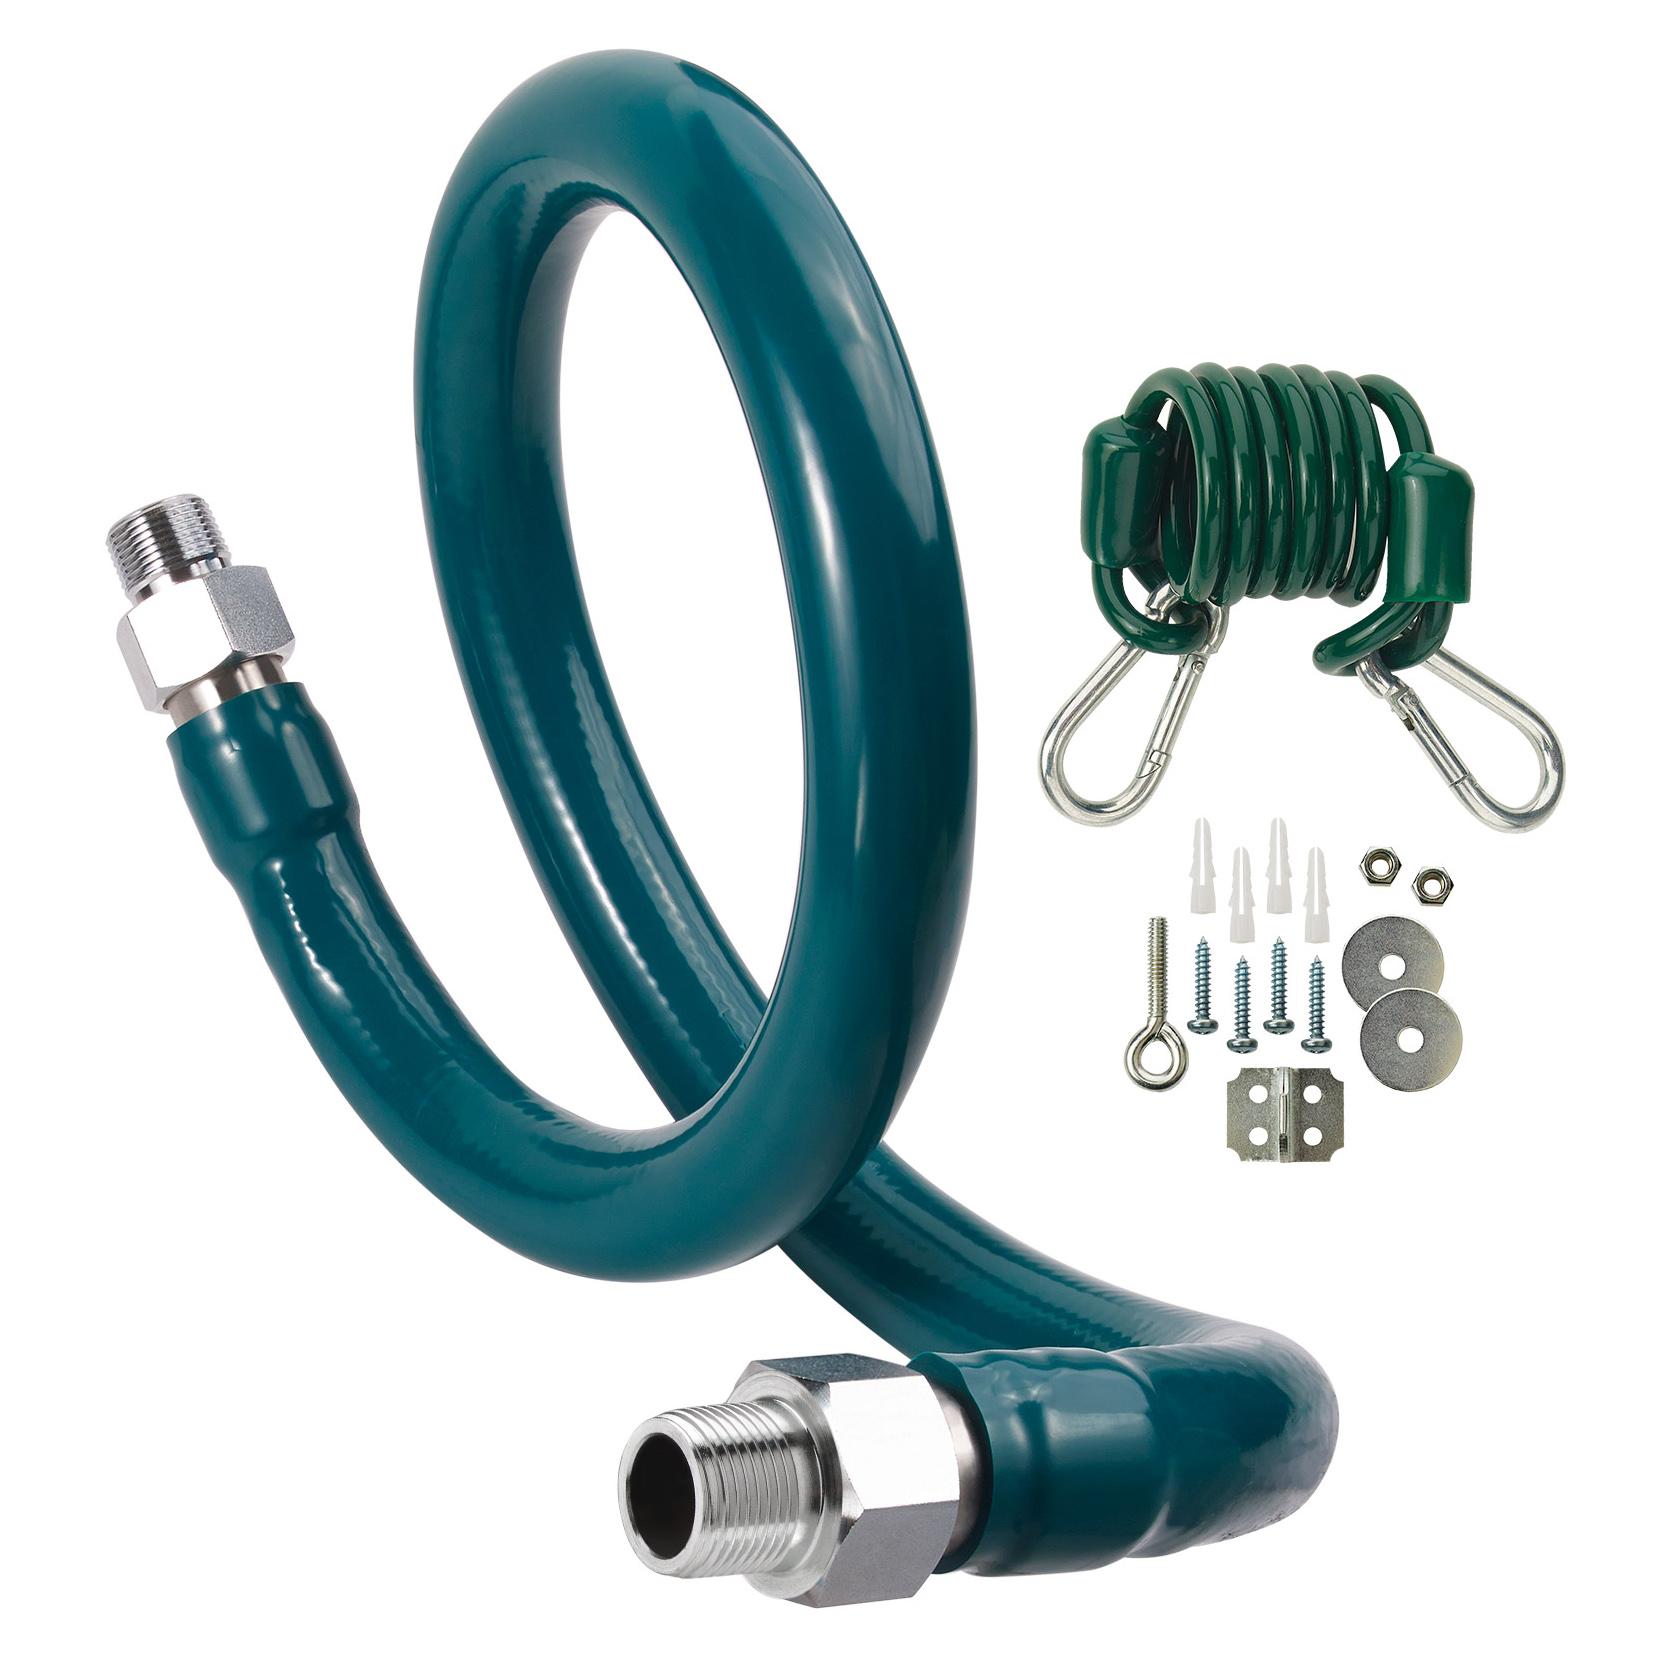 Krowne Metal M7560K6 gas connector hose kit